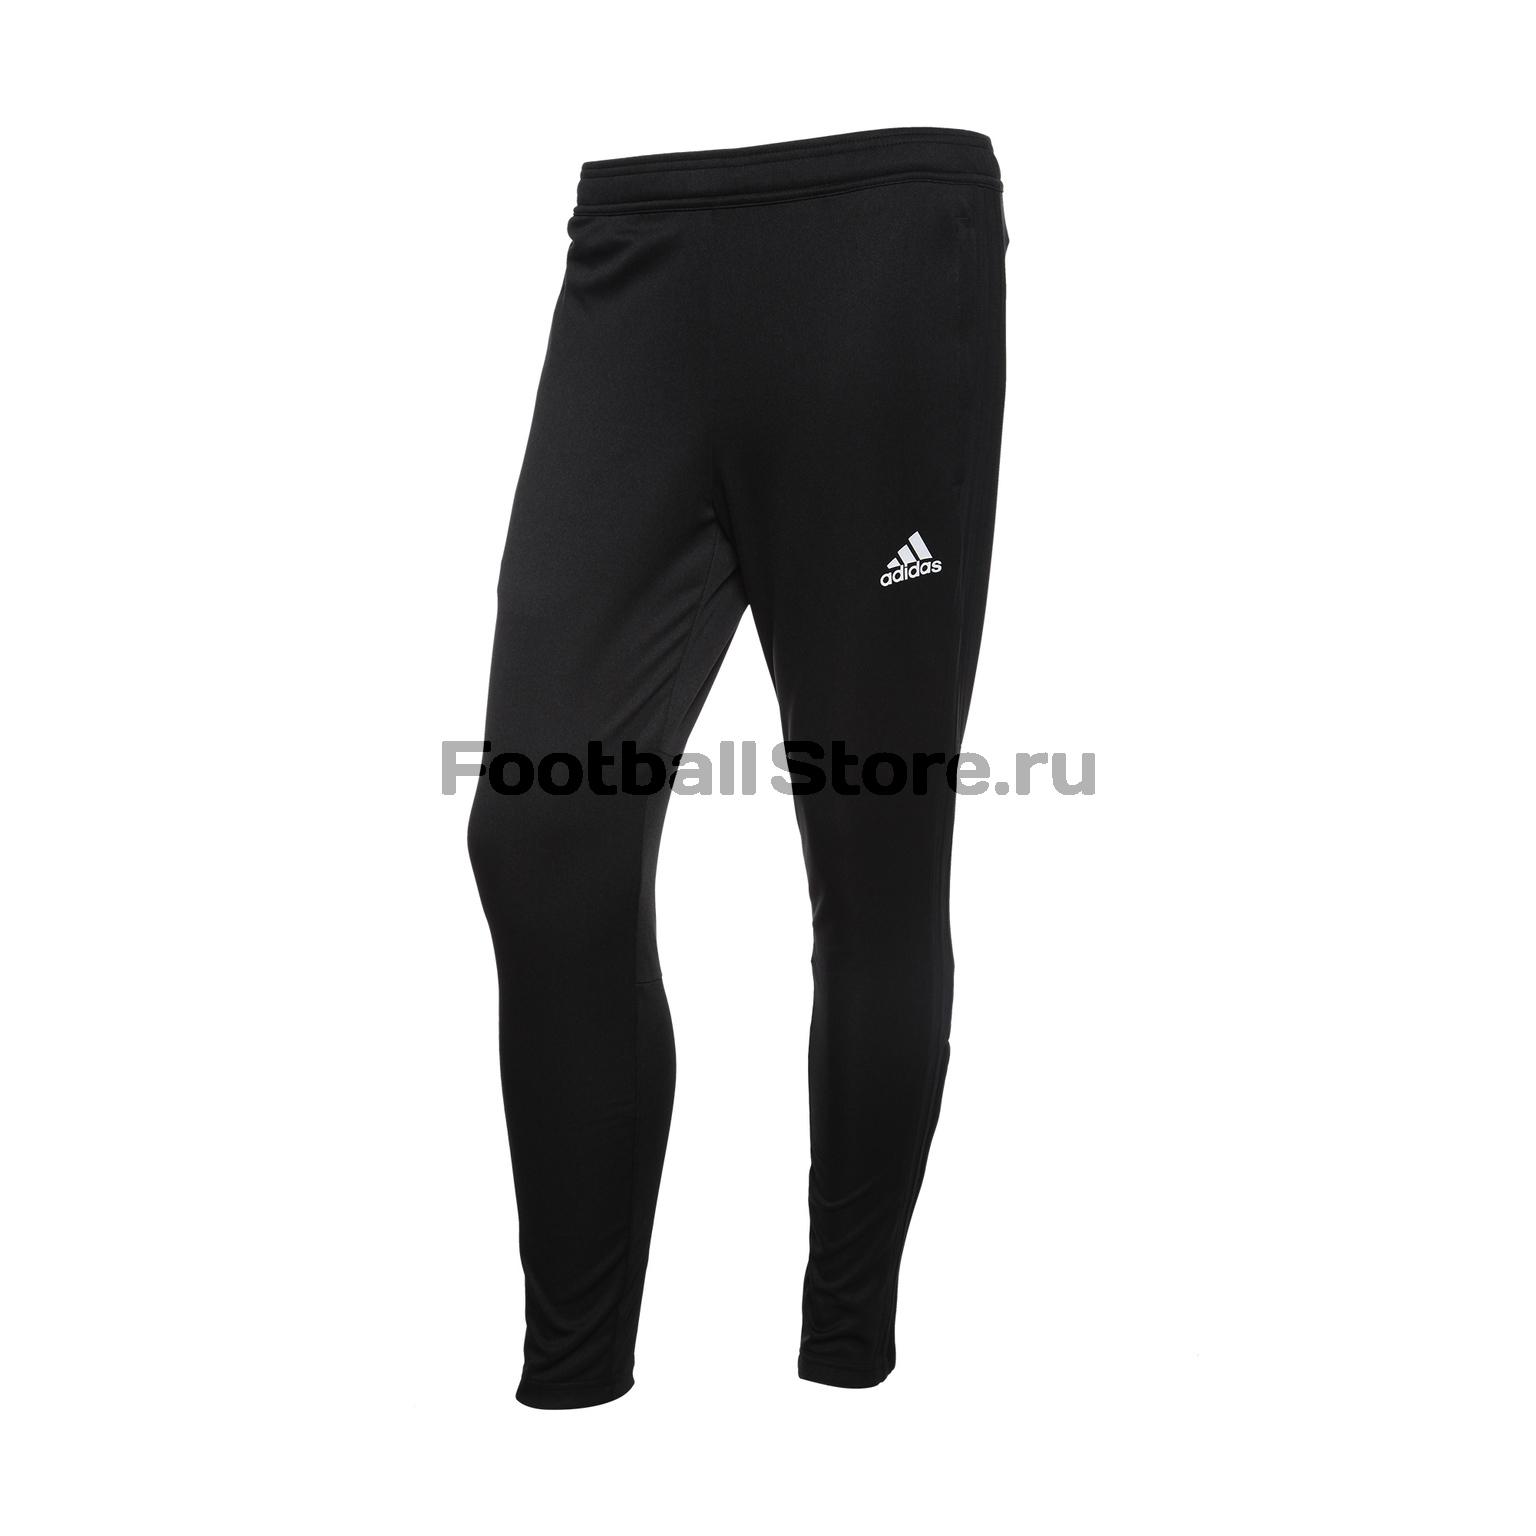 Брюки Adidas Con18 TR Pnt BS0526 брюки adidas con16 trg pnt ab3131